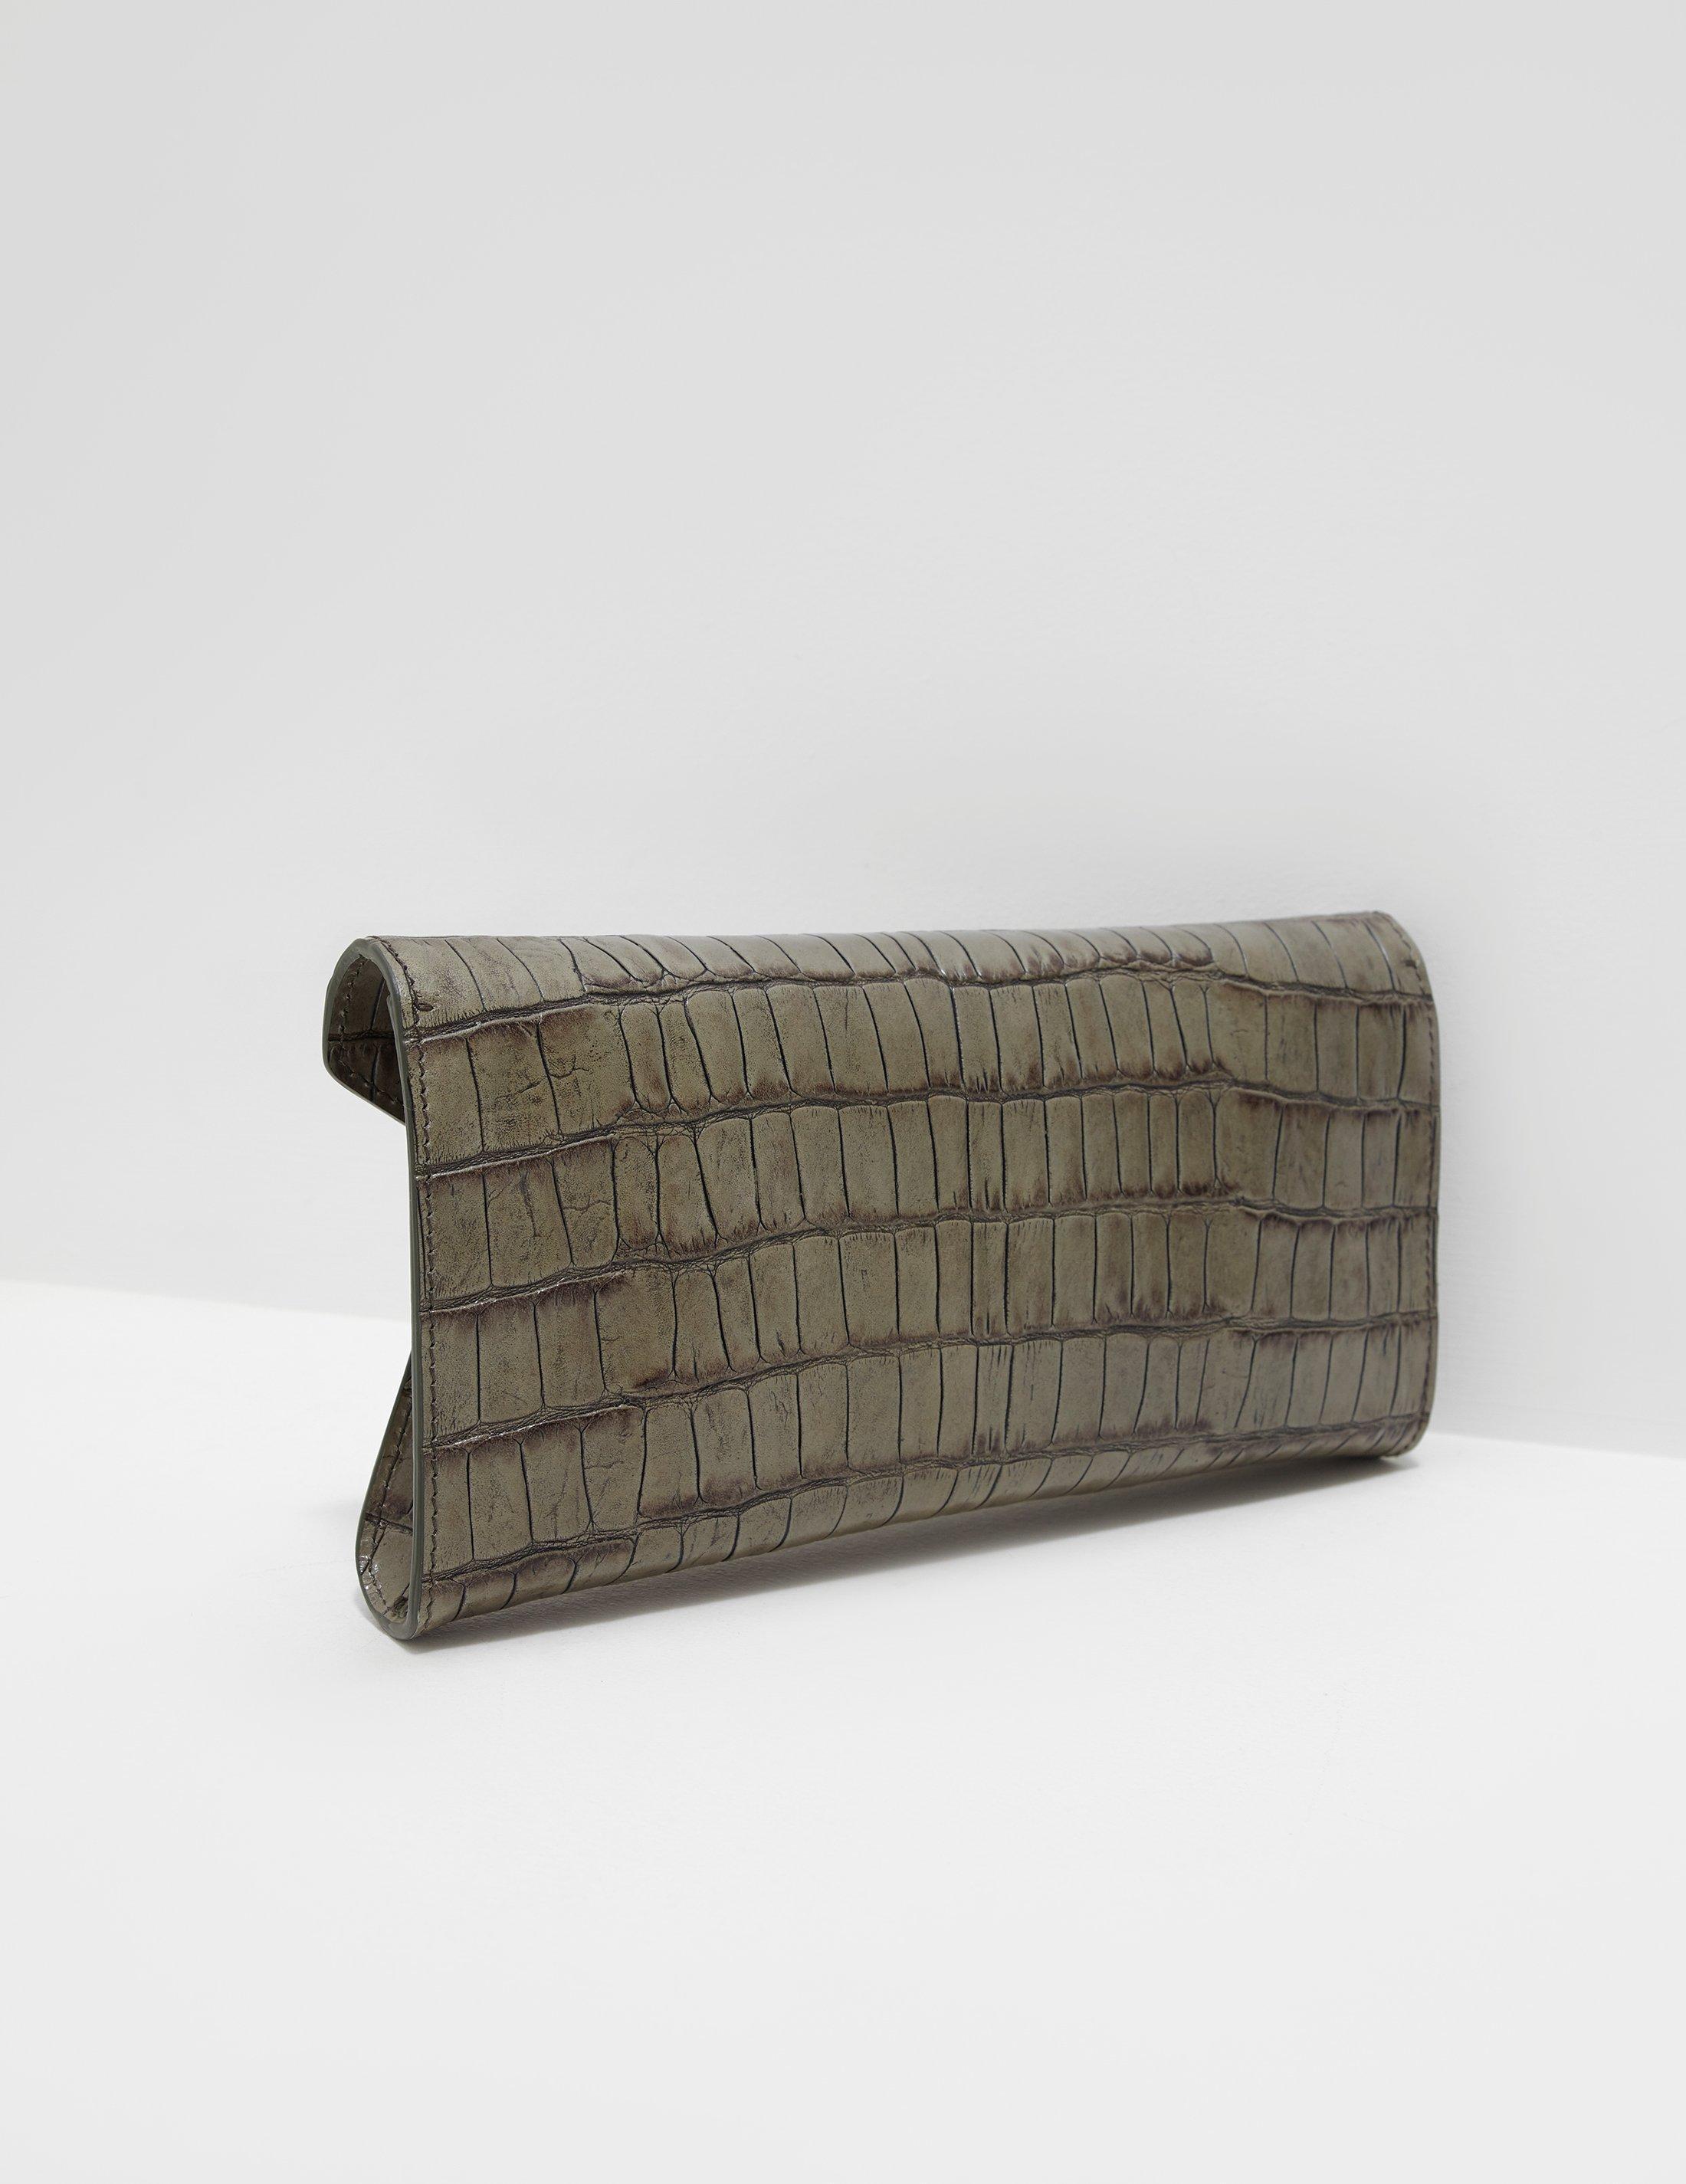 ee1f6f3a2d04 Vivienne Westwood - Lisa Croc Envelope Clutch Bag - Online Exclusive Green  - Lyst. View fullscreen